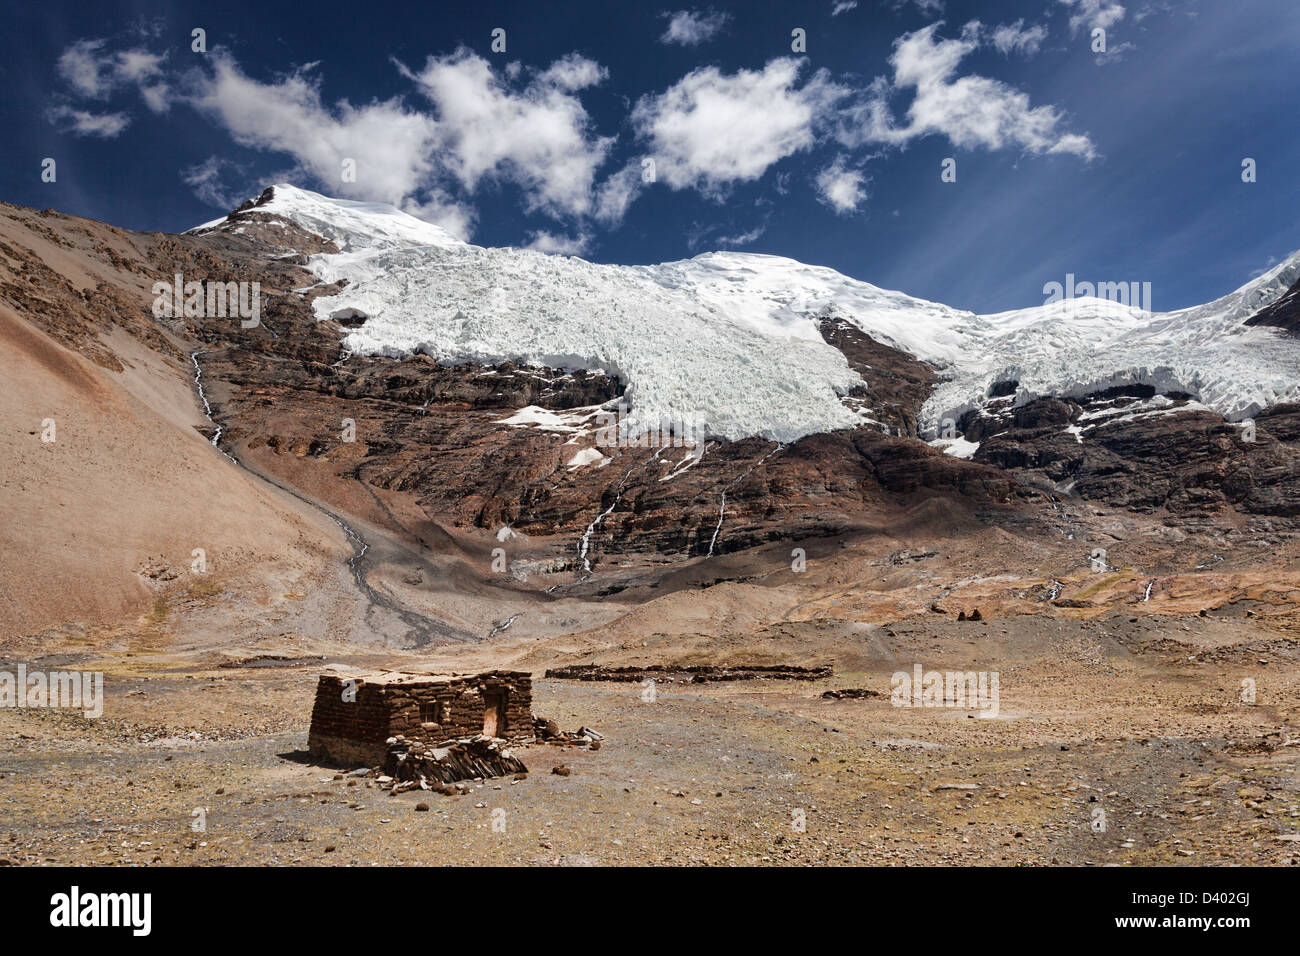 Karola Glacier and Shepherd's Shelter near Gyantse, Tibet Stock Photo